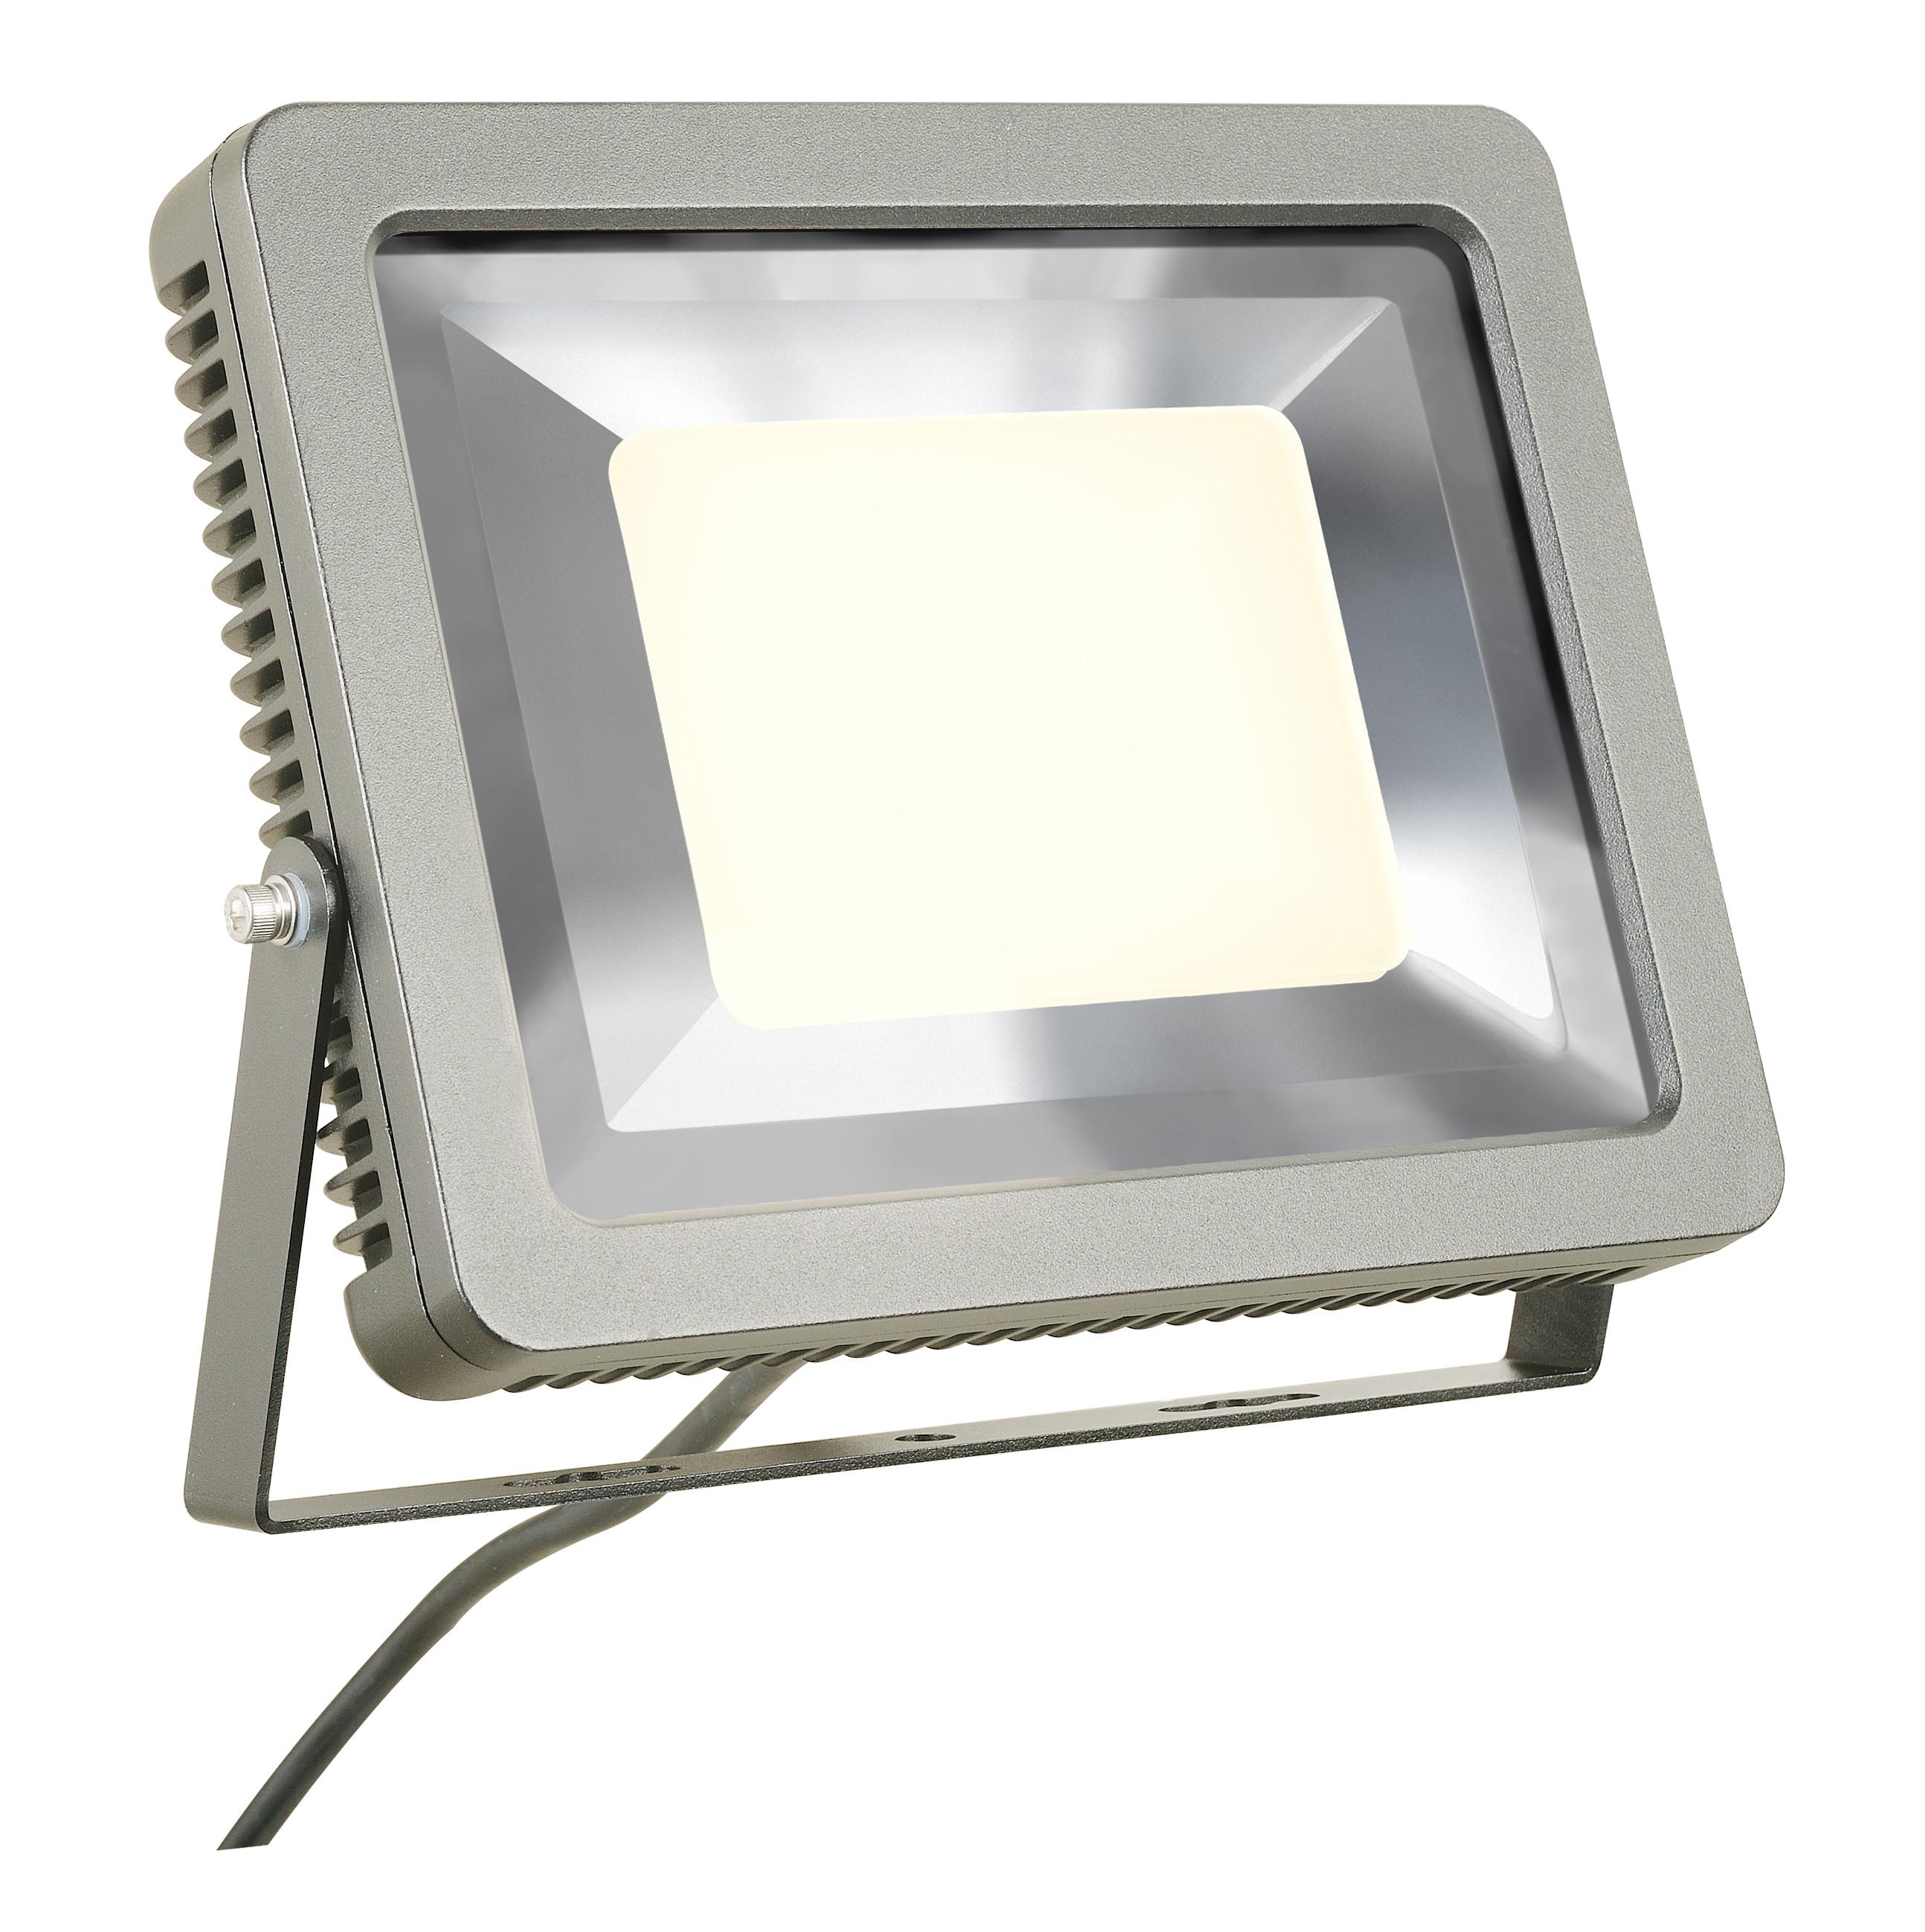 1 Stk SPOODI Strahler, eckig, 60W, silbergrau, 3000K LED LI232844--